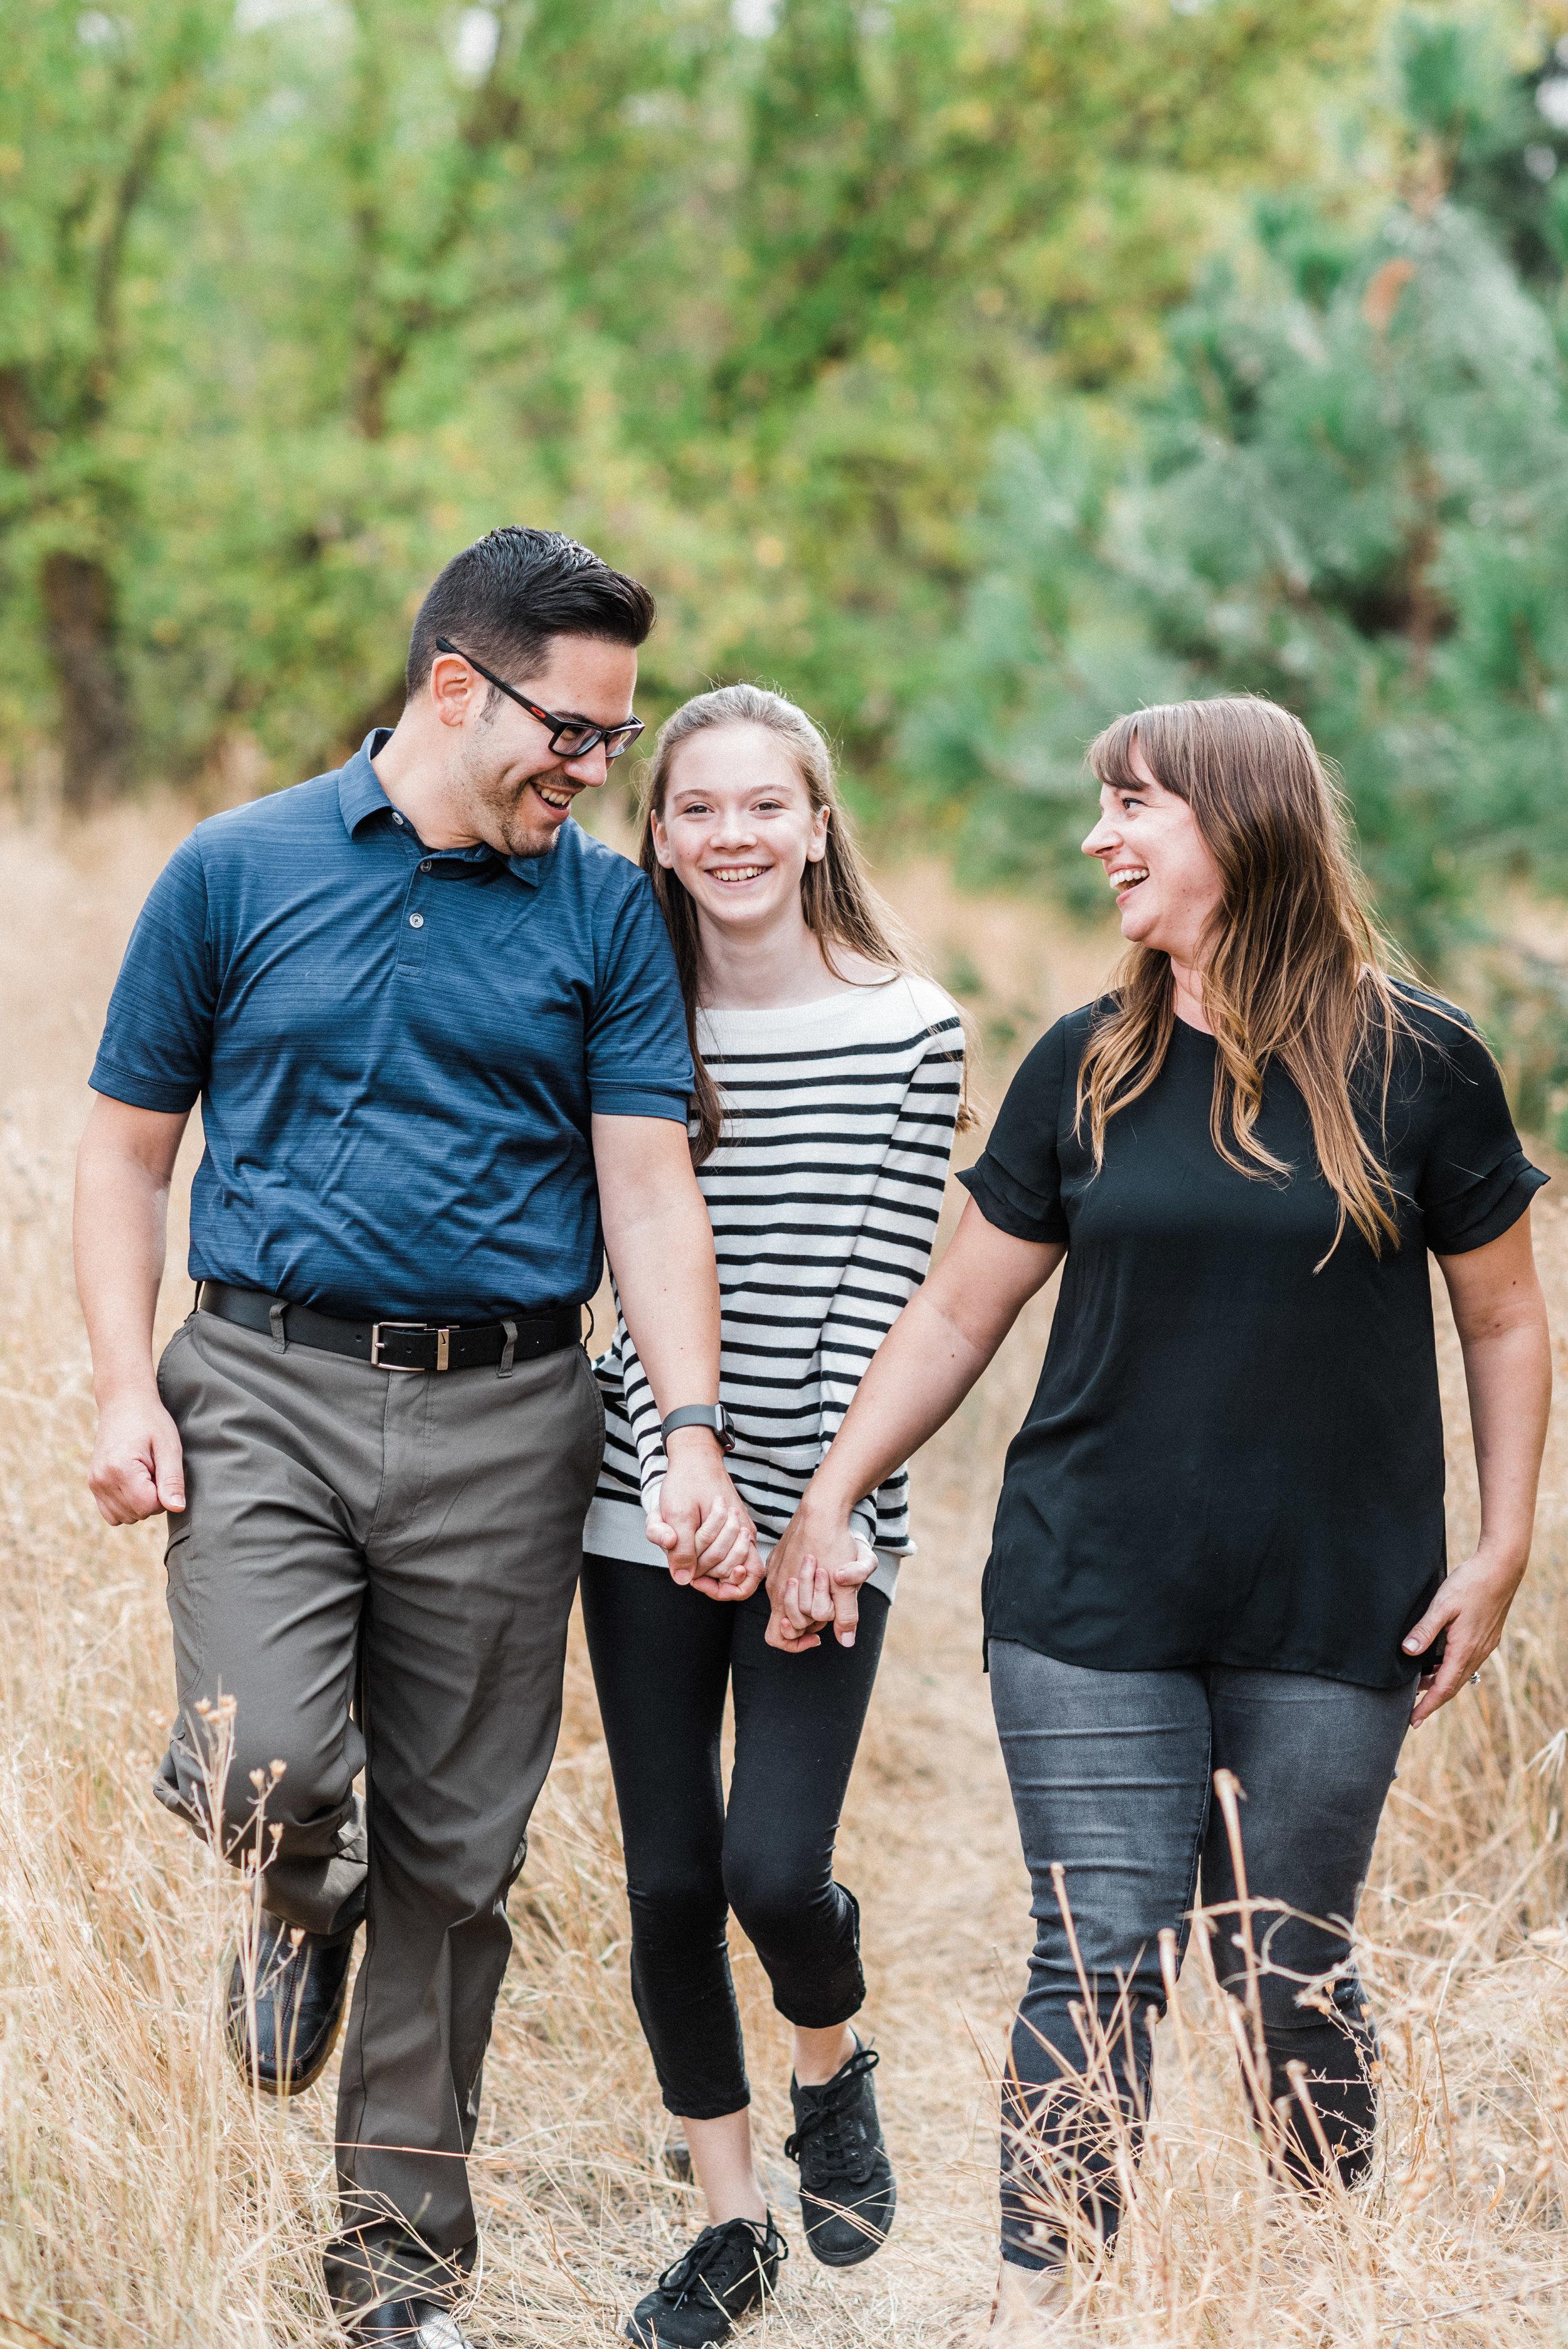 spokane_fall_family_photography_session (14 of 27).jpg